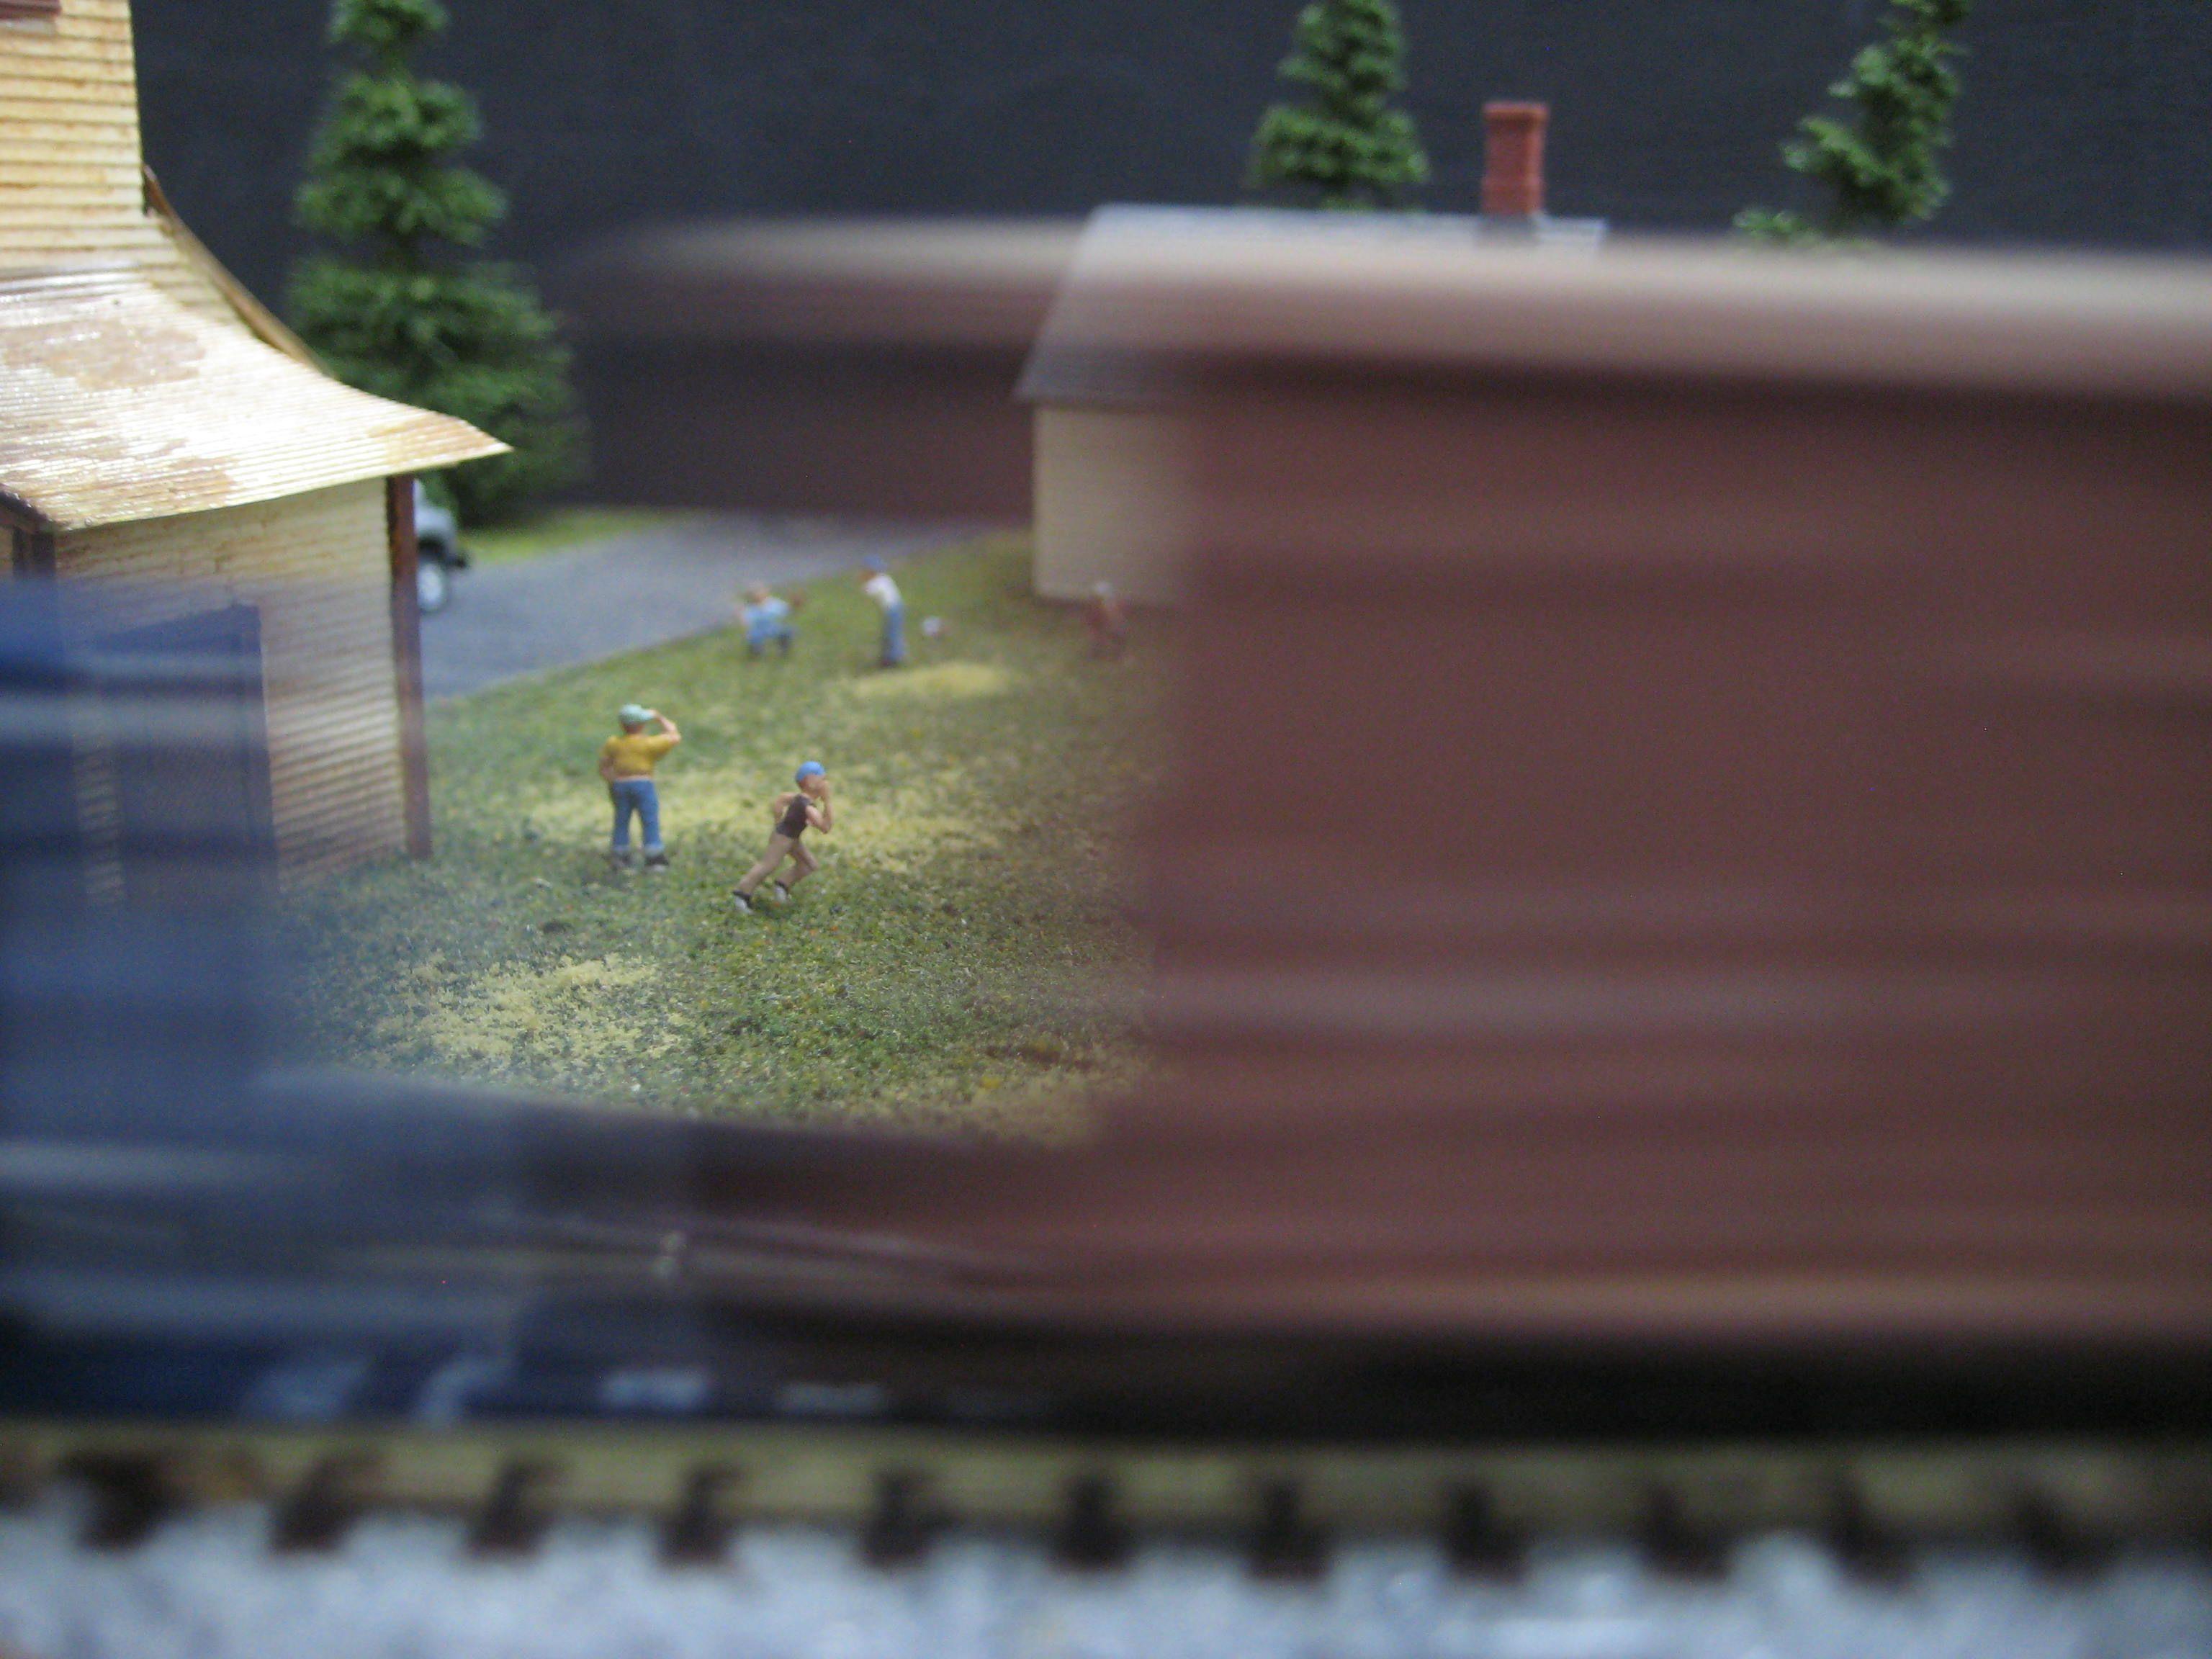 20151101 10th annual gaithersburg model train show t trak wiki